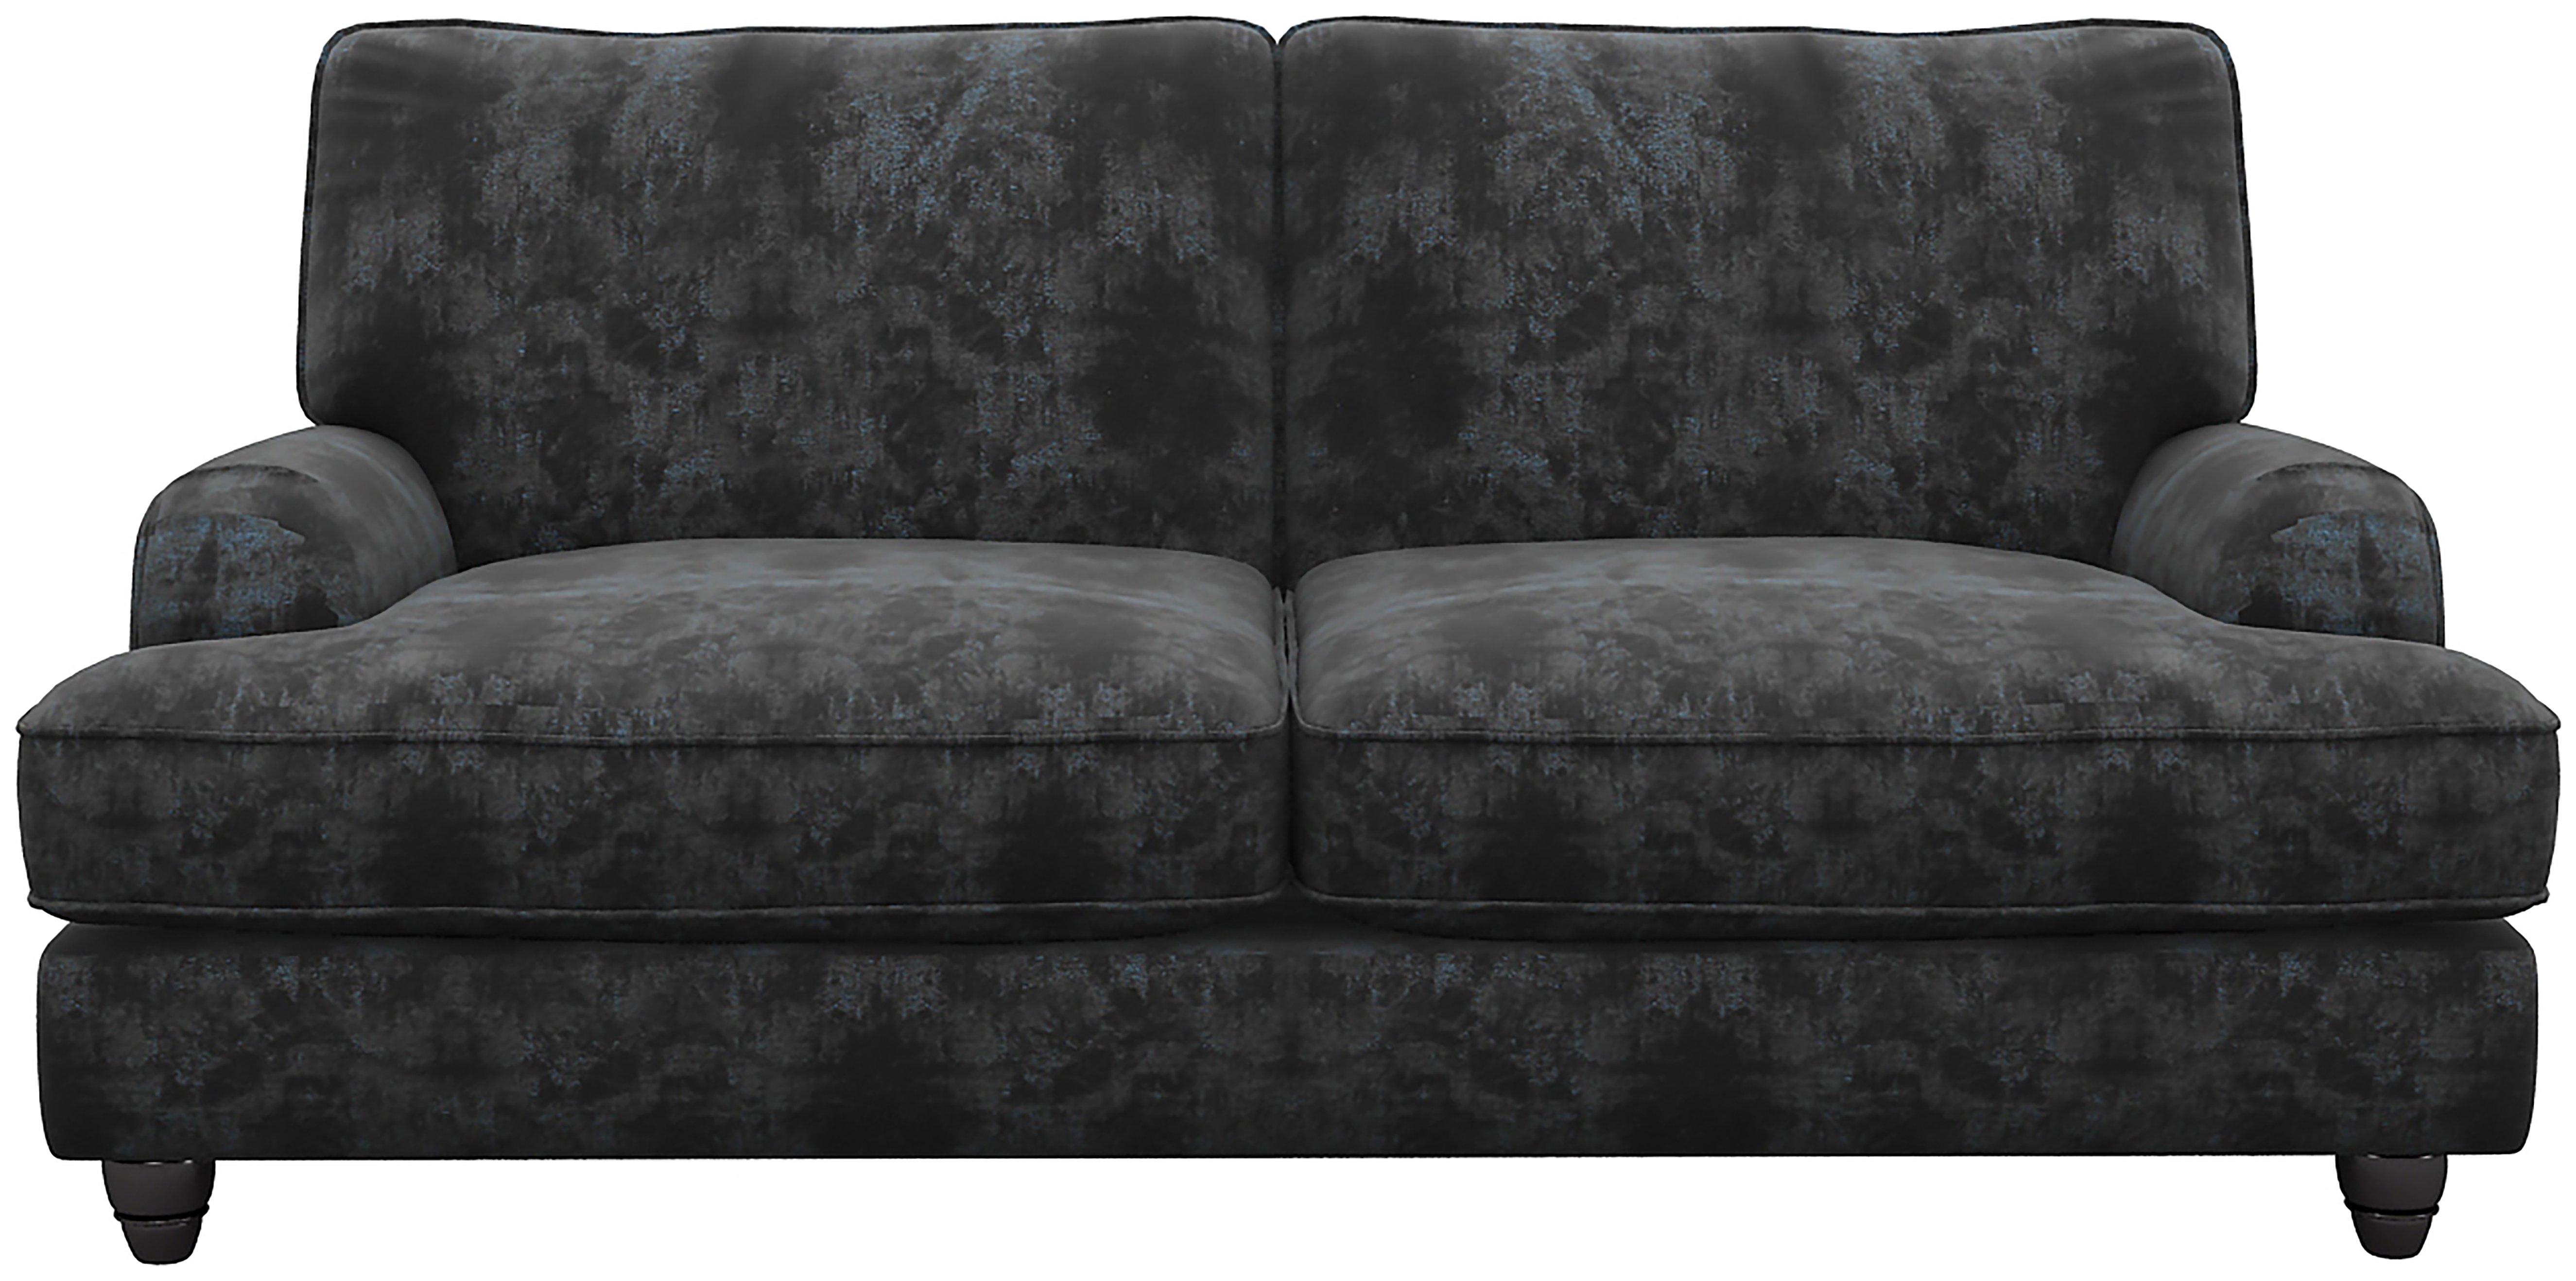 Heart of House Adeline 2 Seater Shimmer Fabric Sofa - Black